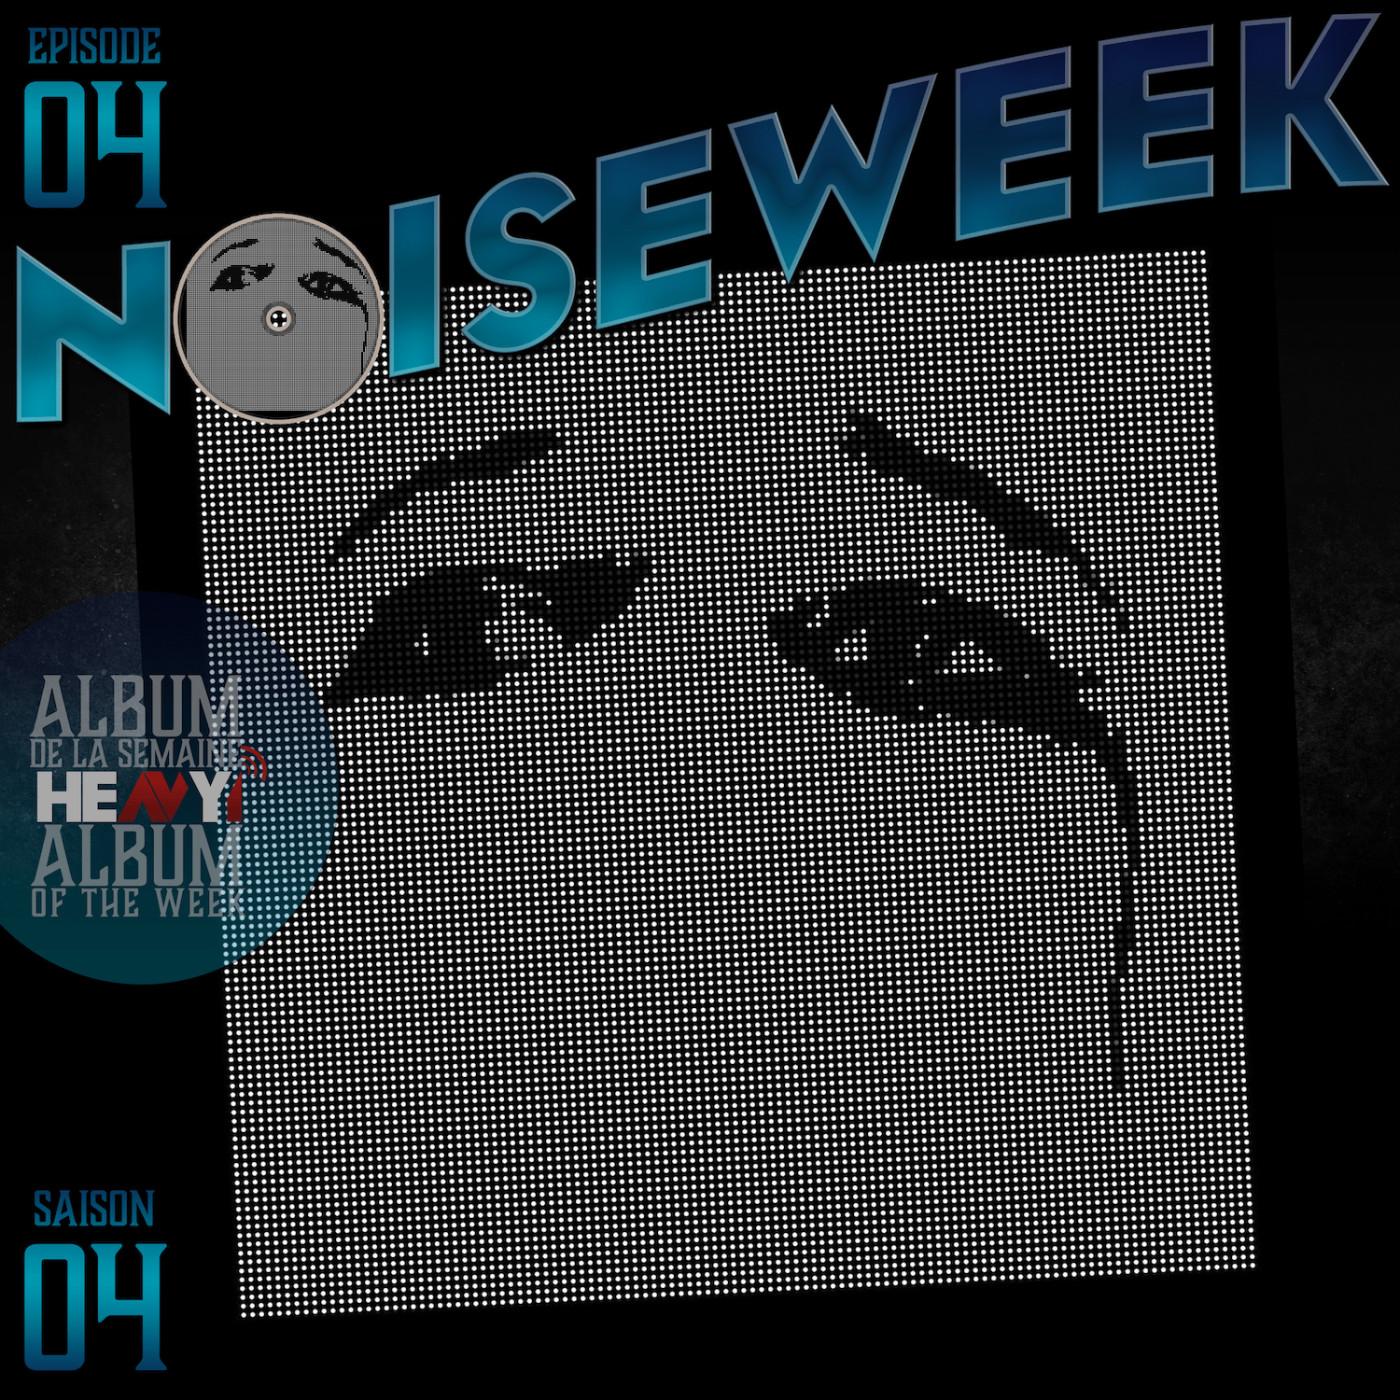 Noiseweek #04 Saison 4